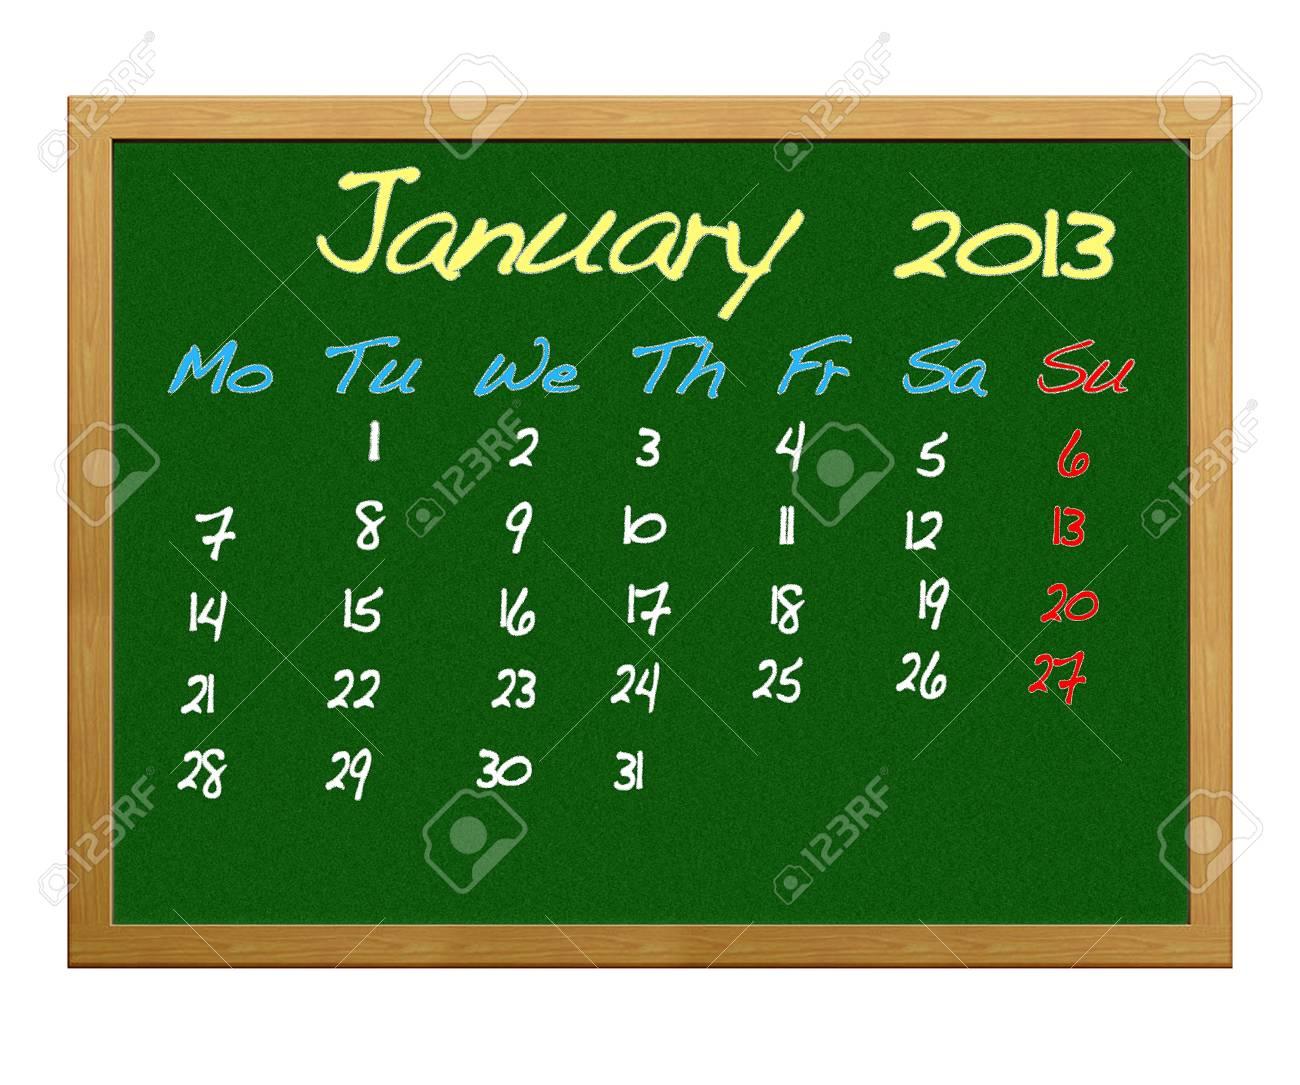 Calendar 2013, January. Stock Photo - 12215102